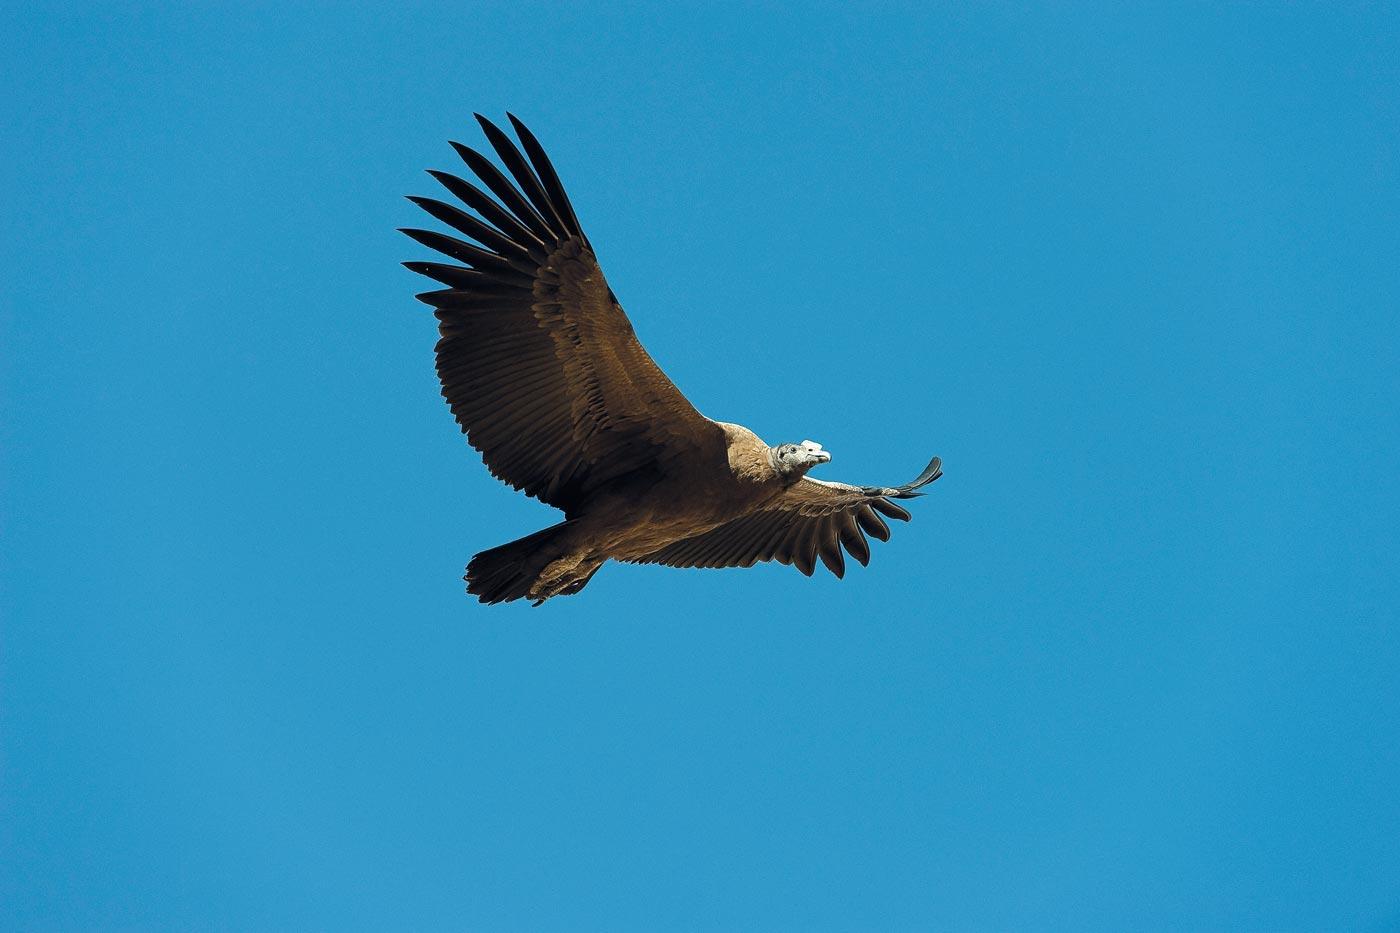 Andenkondor - der grösste Vogel der Welt